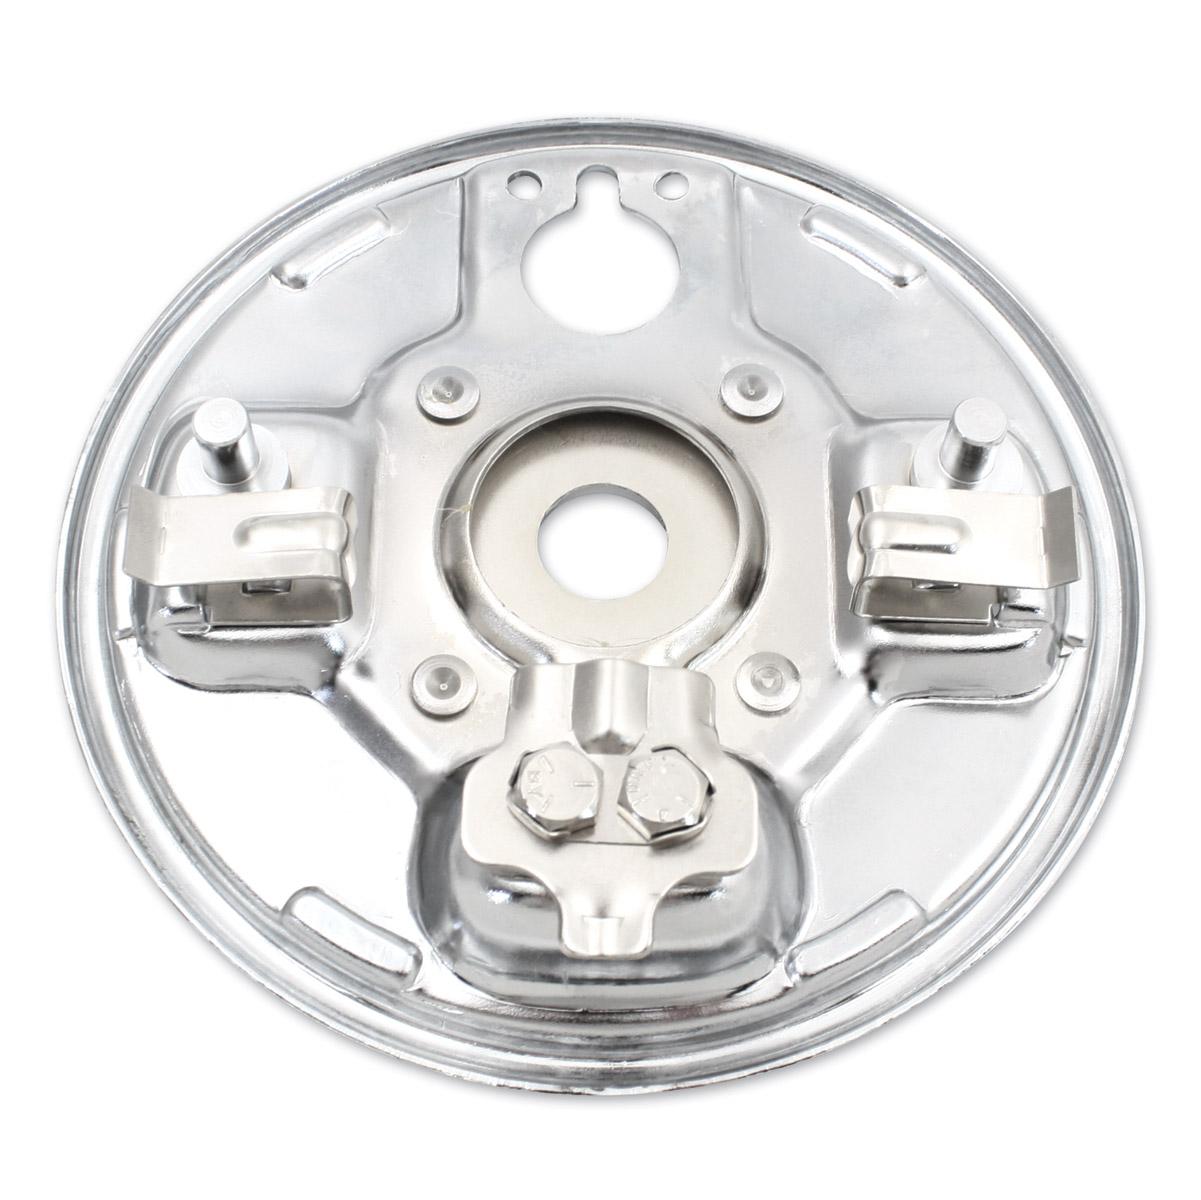 Hydraulic Rear Brake Side Plate